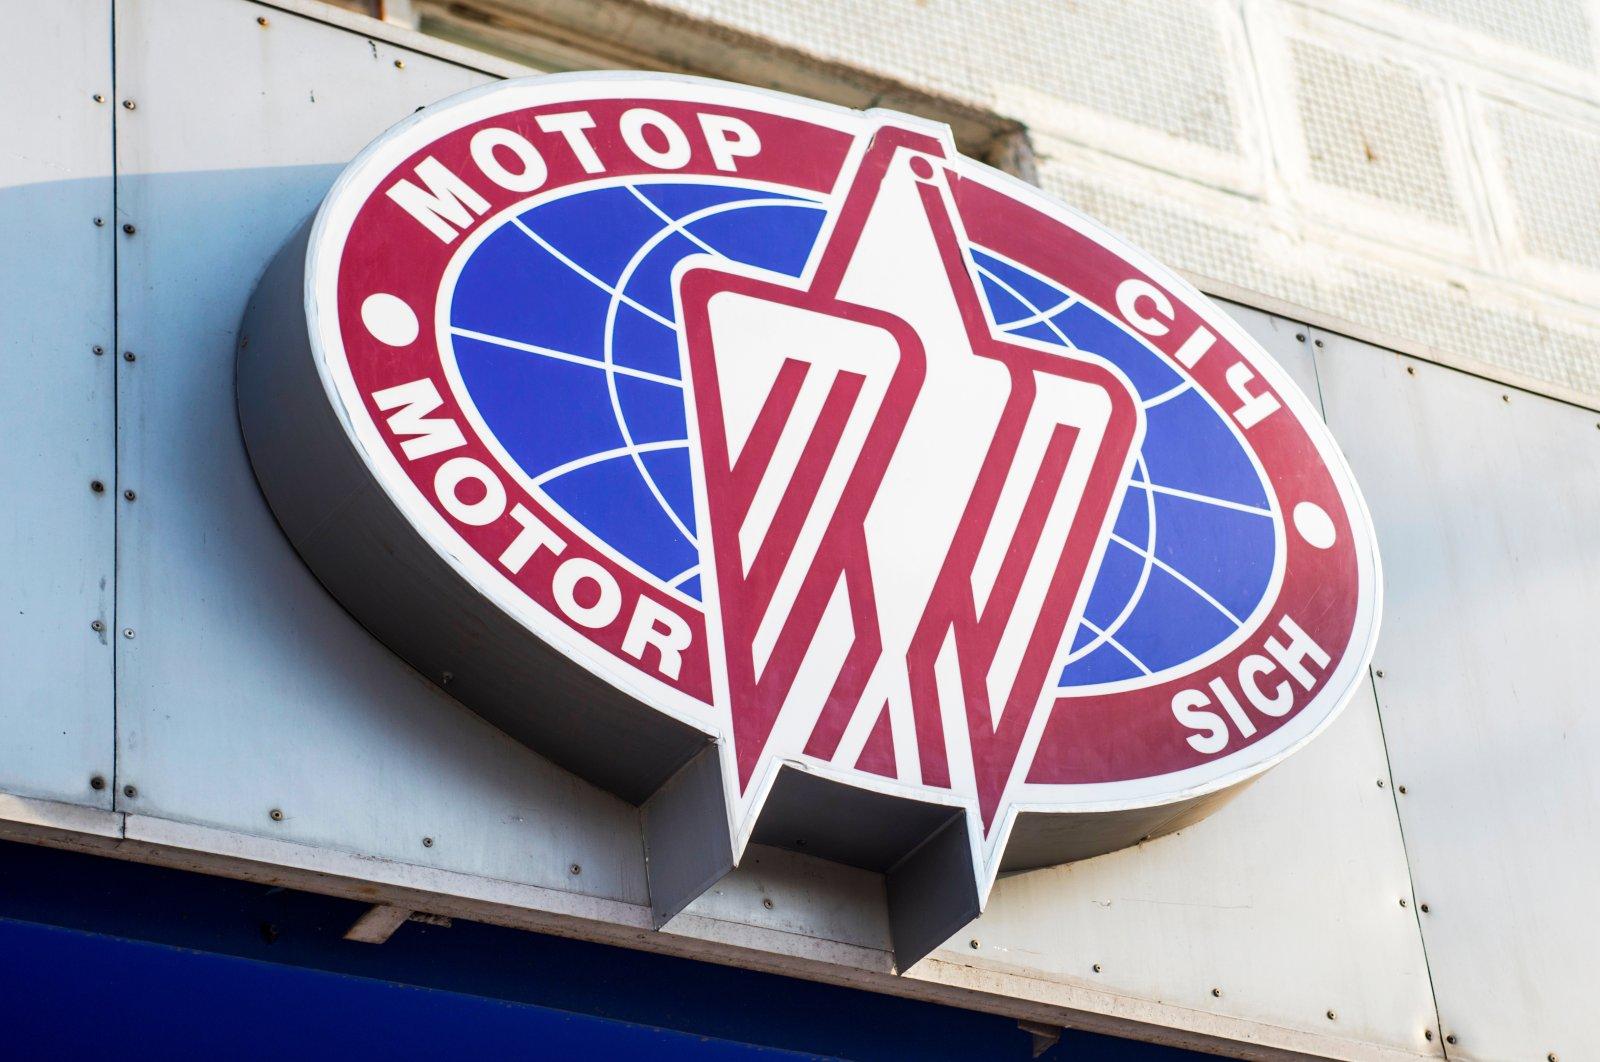 The Motor Sich logo is seen on a company building, Zaporozhye, Ukraine,  Feb. 2, 2021. (Shutterstock Photo)